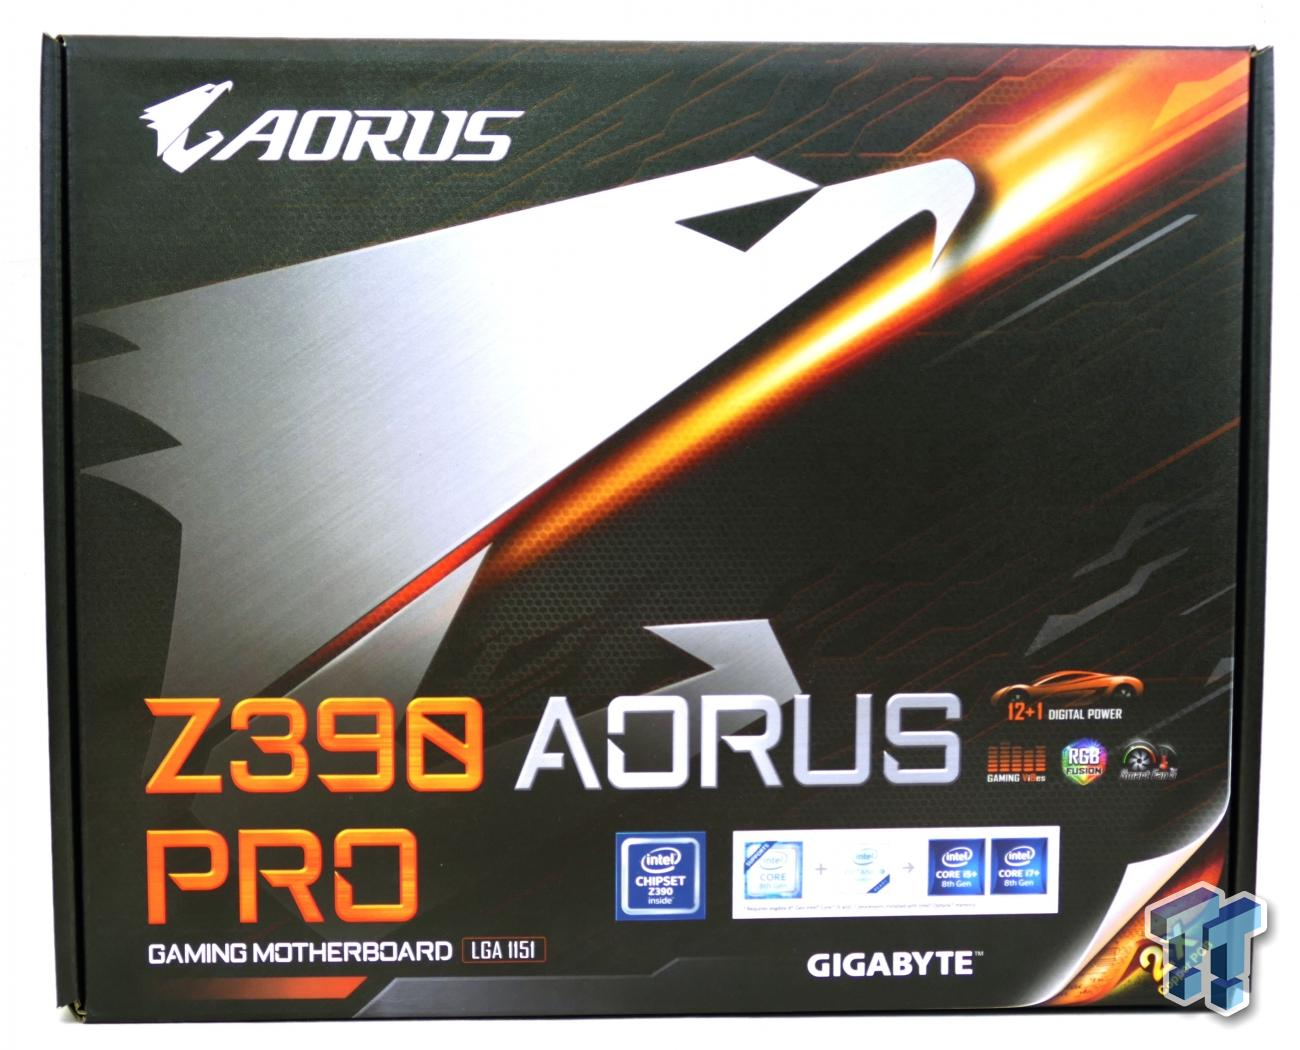 GIGABYTE Z390 Aorus Pro (Intel Z390) Motherboard Review